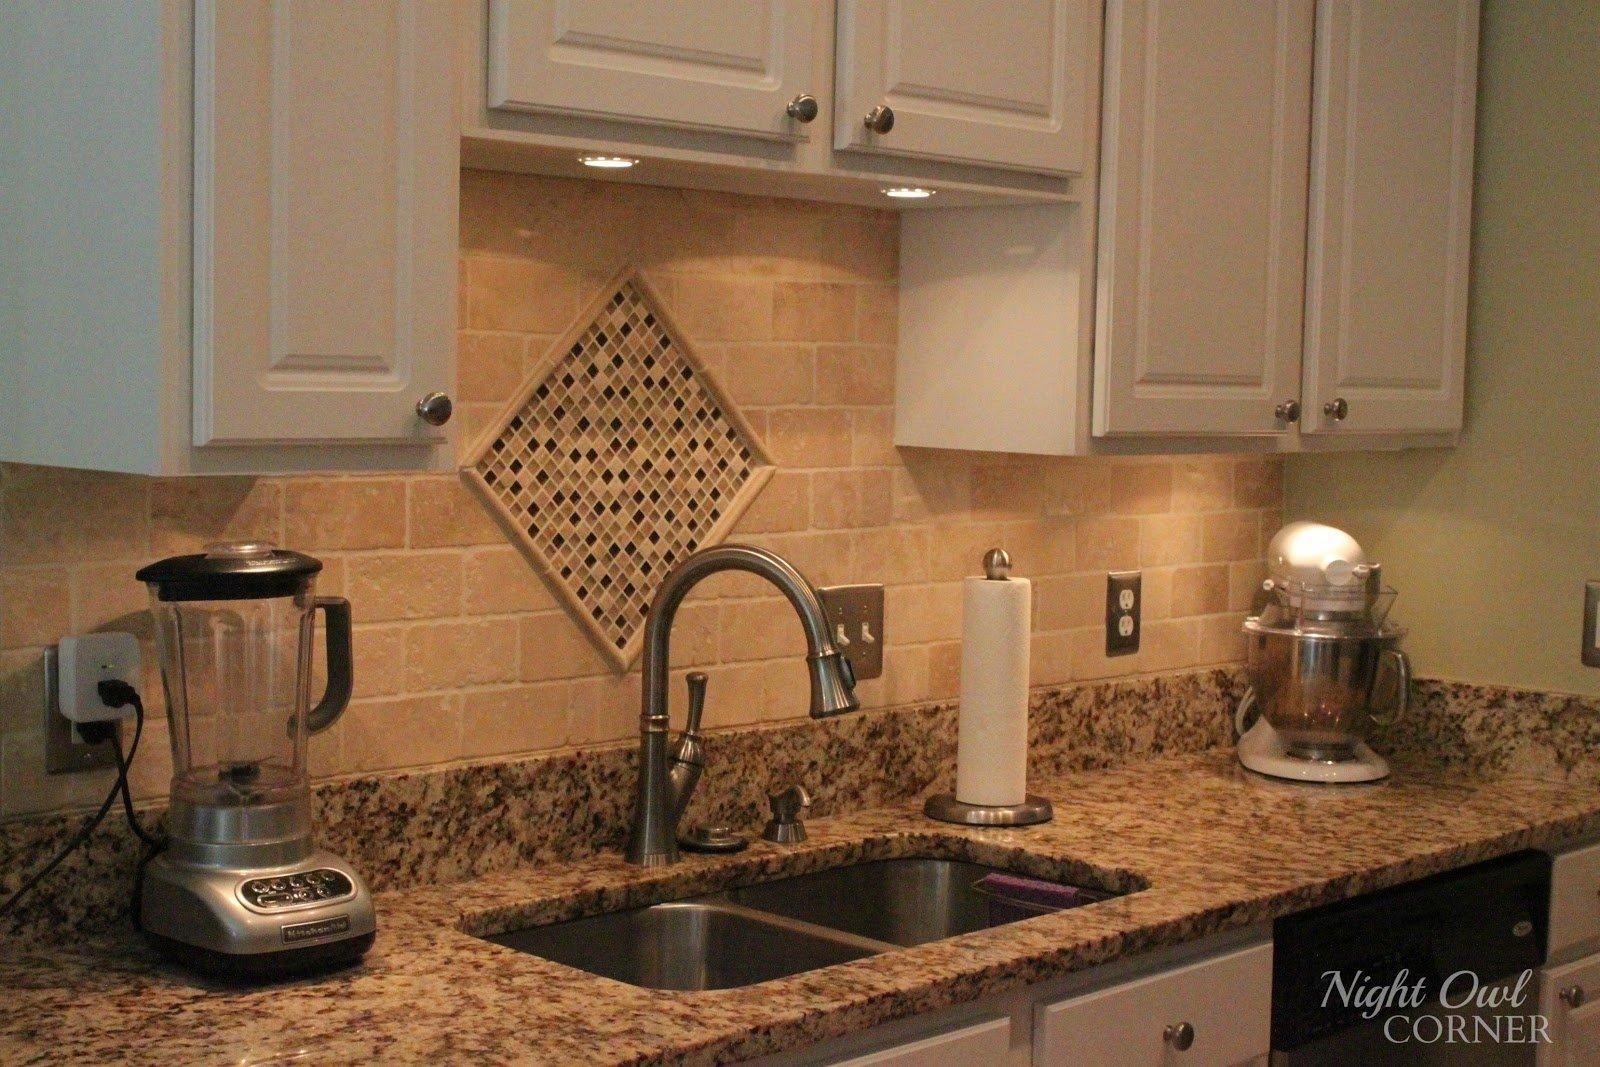 10 Gorgeous Ideas For Kitchen Backsplash With Granite Countertops kitchen countertop tile backsplash ideas e280a2 kitchen backsplash 2020